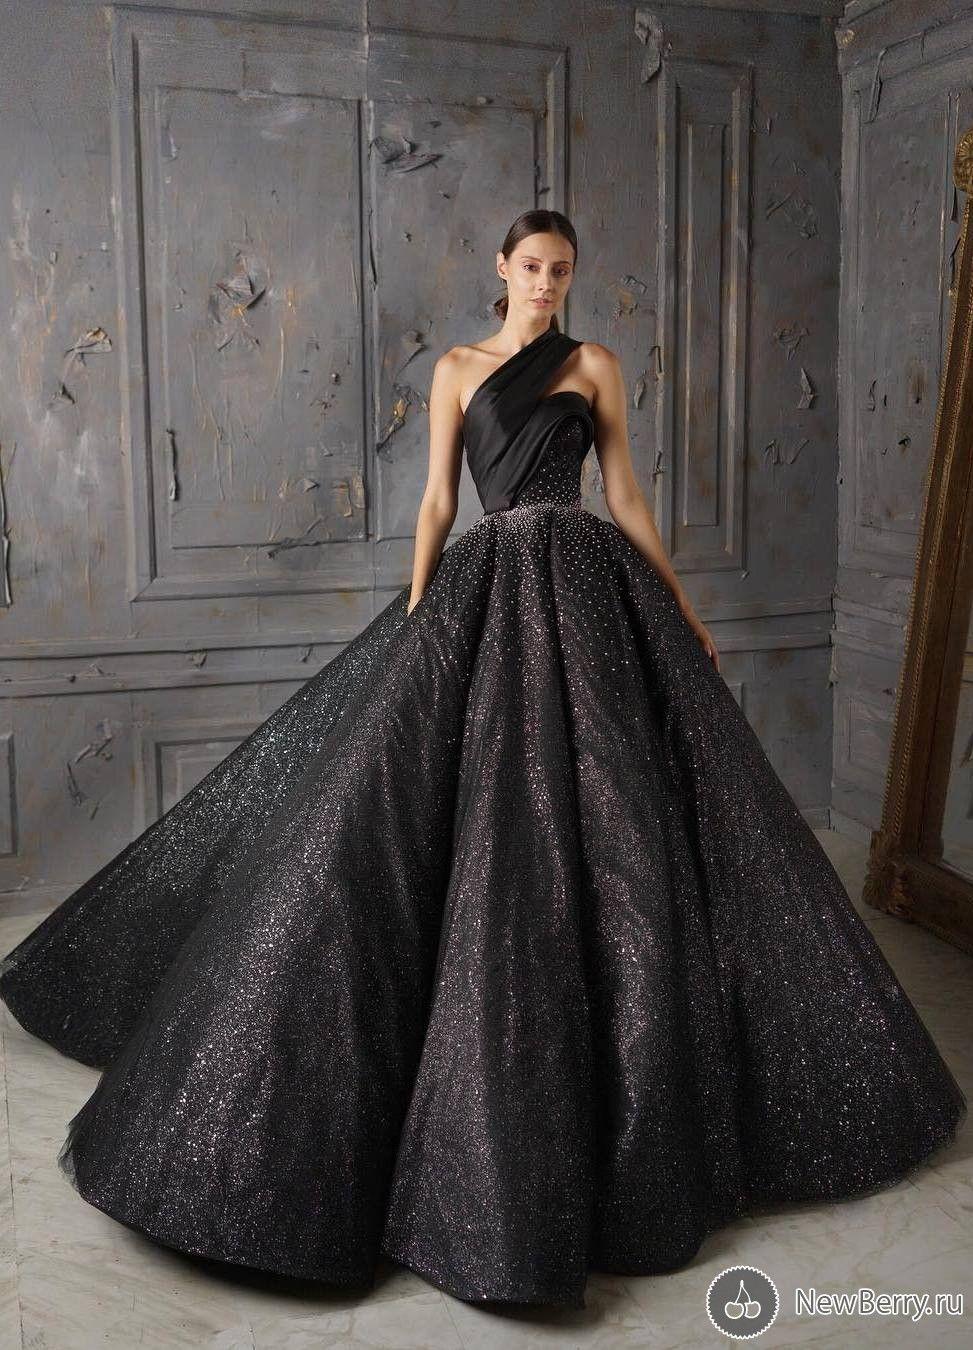 Evening Dresses Mark Bumgarner Spring-Summer 2017 | Ball gowns in ...